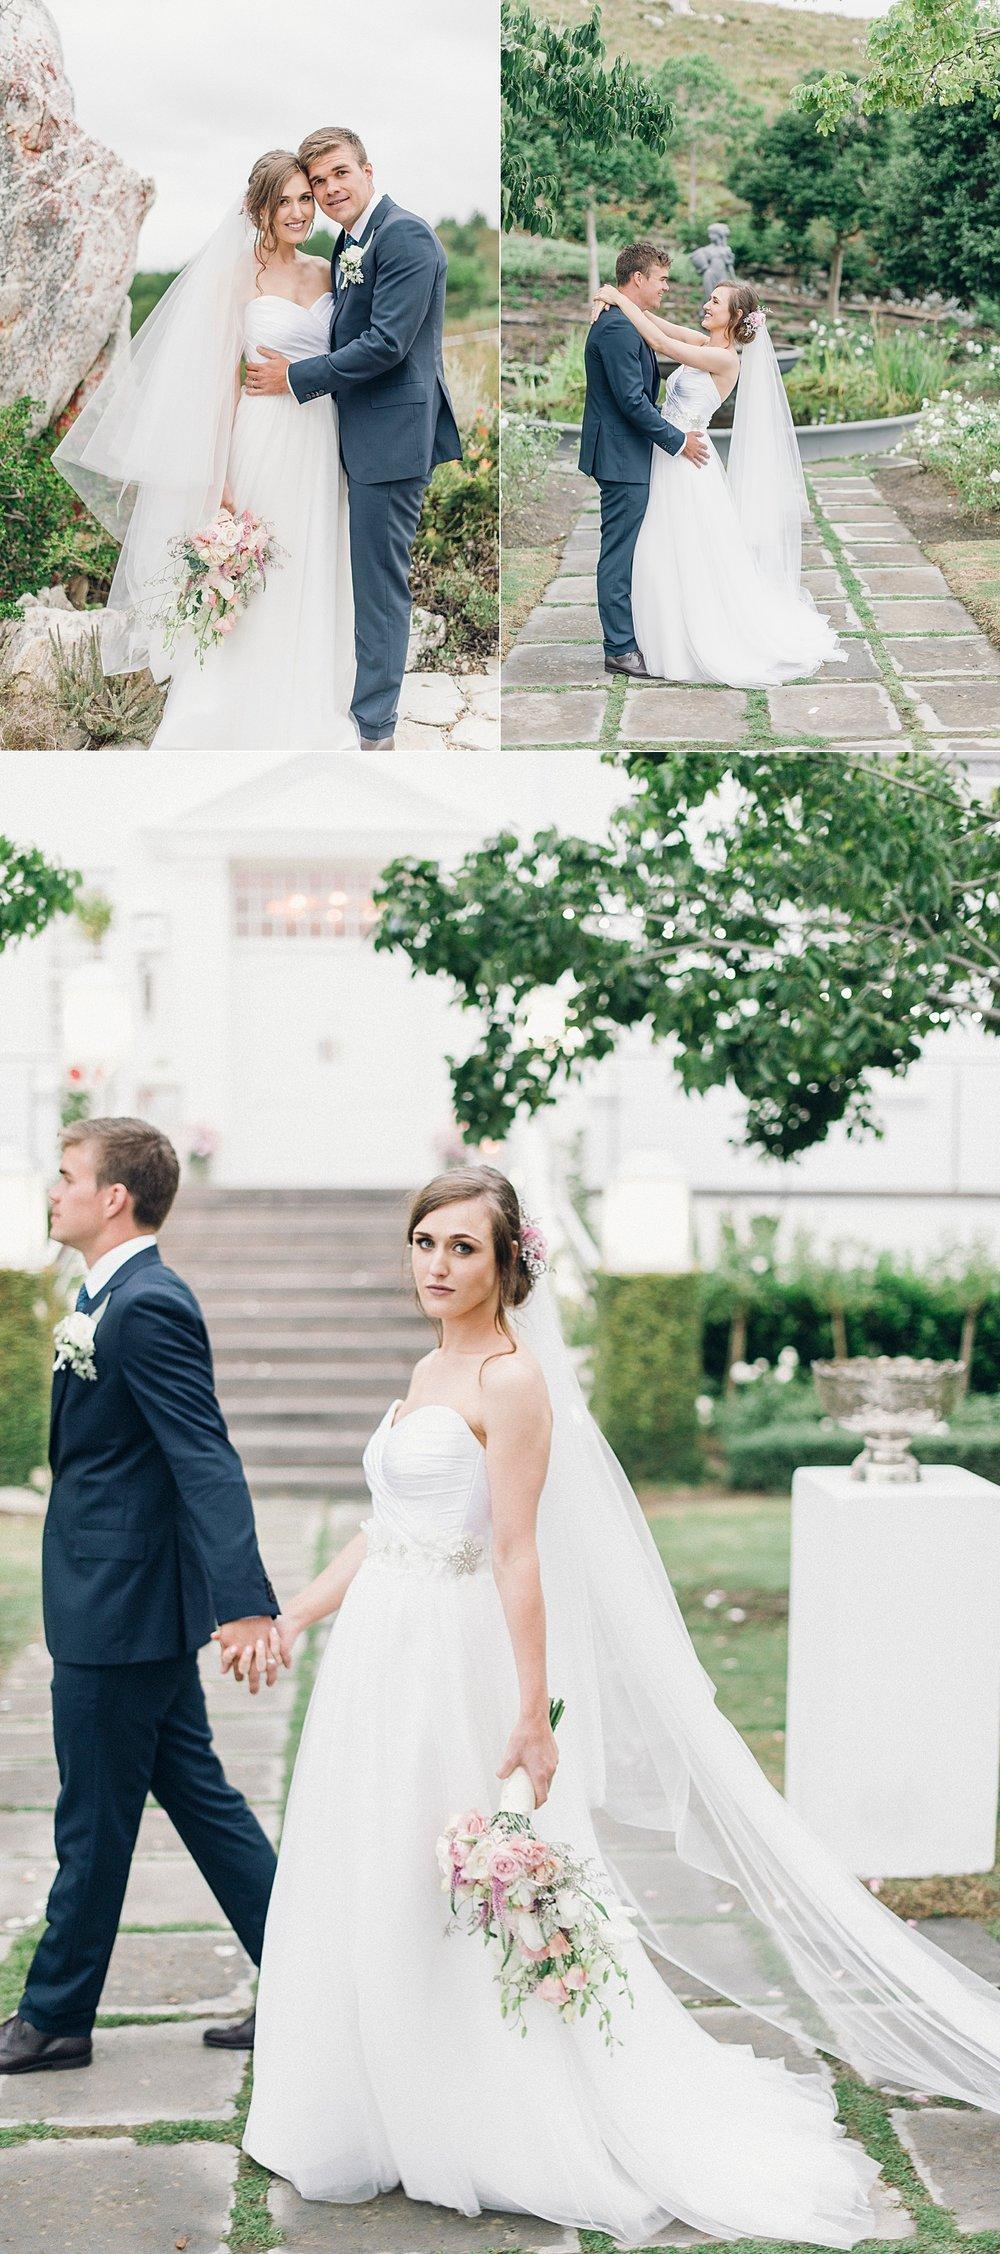 RyanParker_WeddingPhotographer_CapeTown_BonaDea_Hermanus_S&A_DSC_2000.jpg